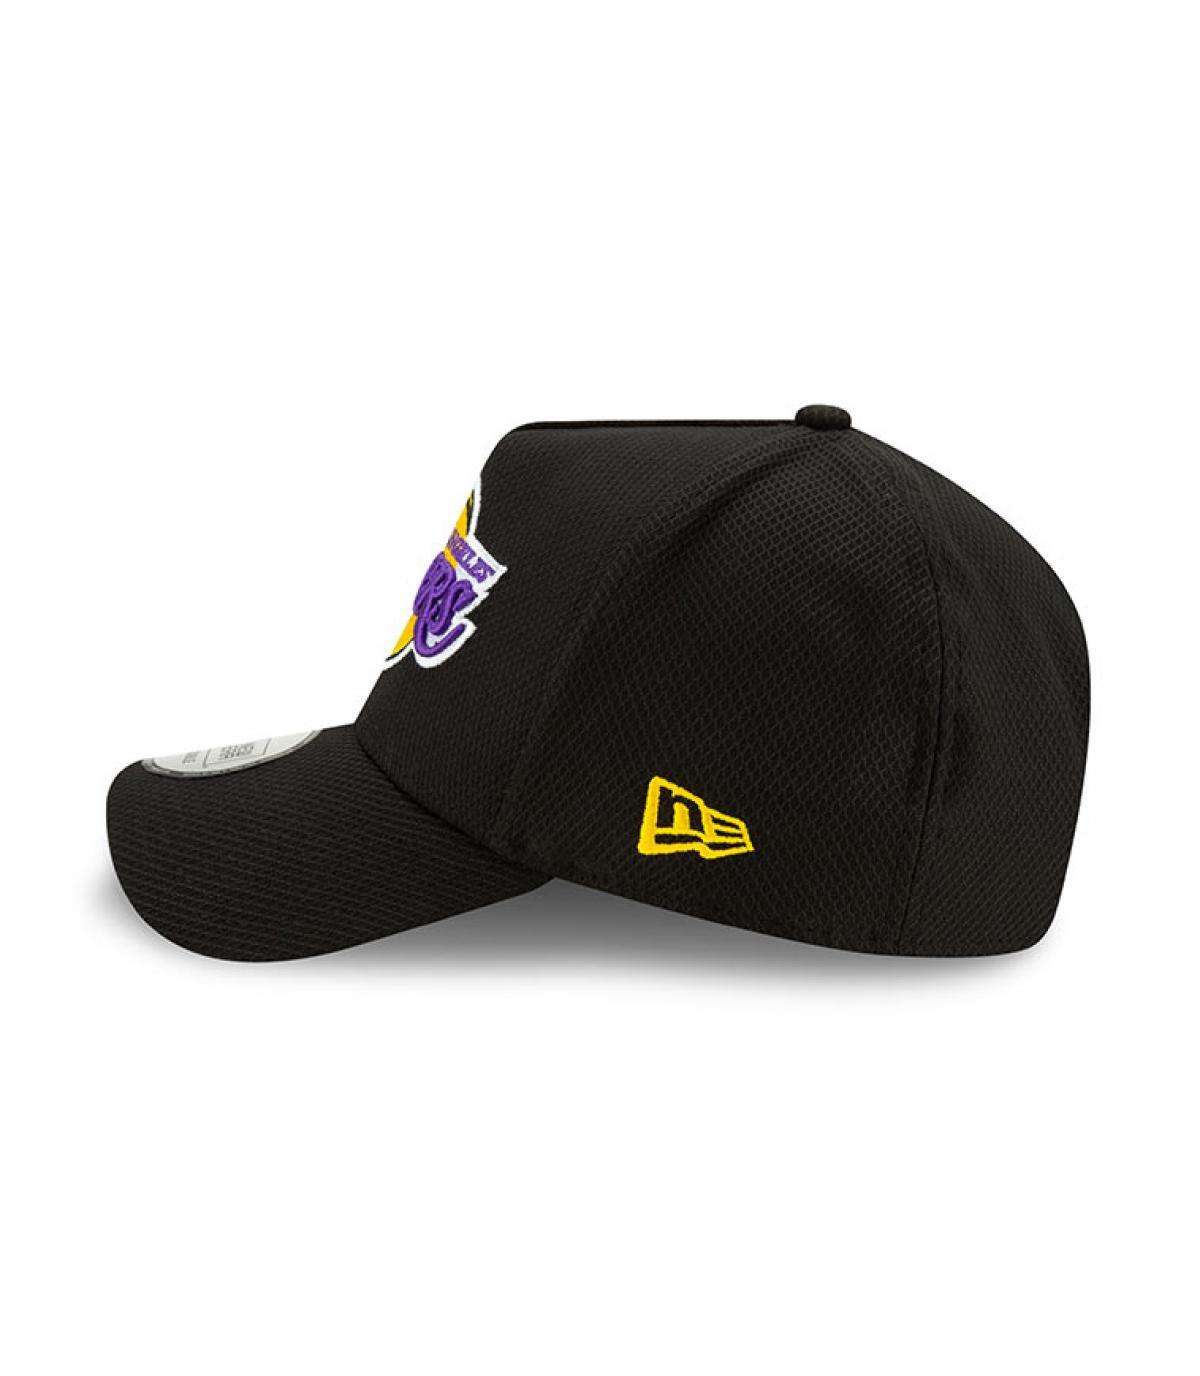 Details League Ess Lakers Diamond Era Aframe - afbeeling 5